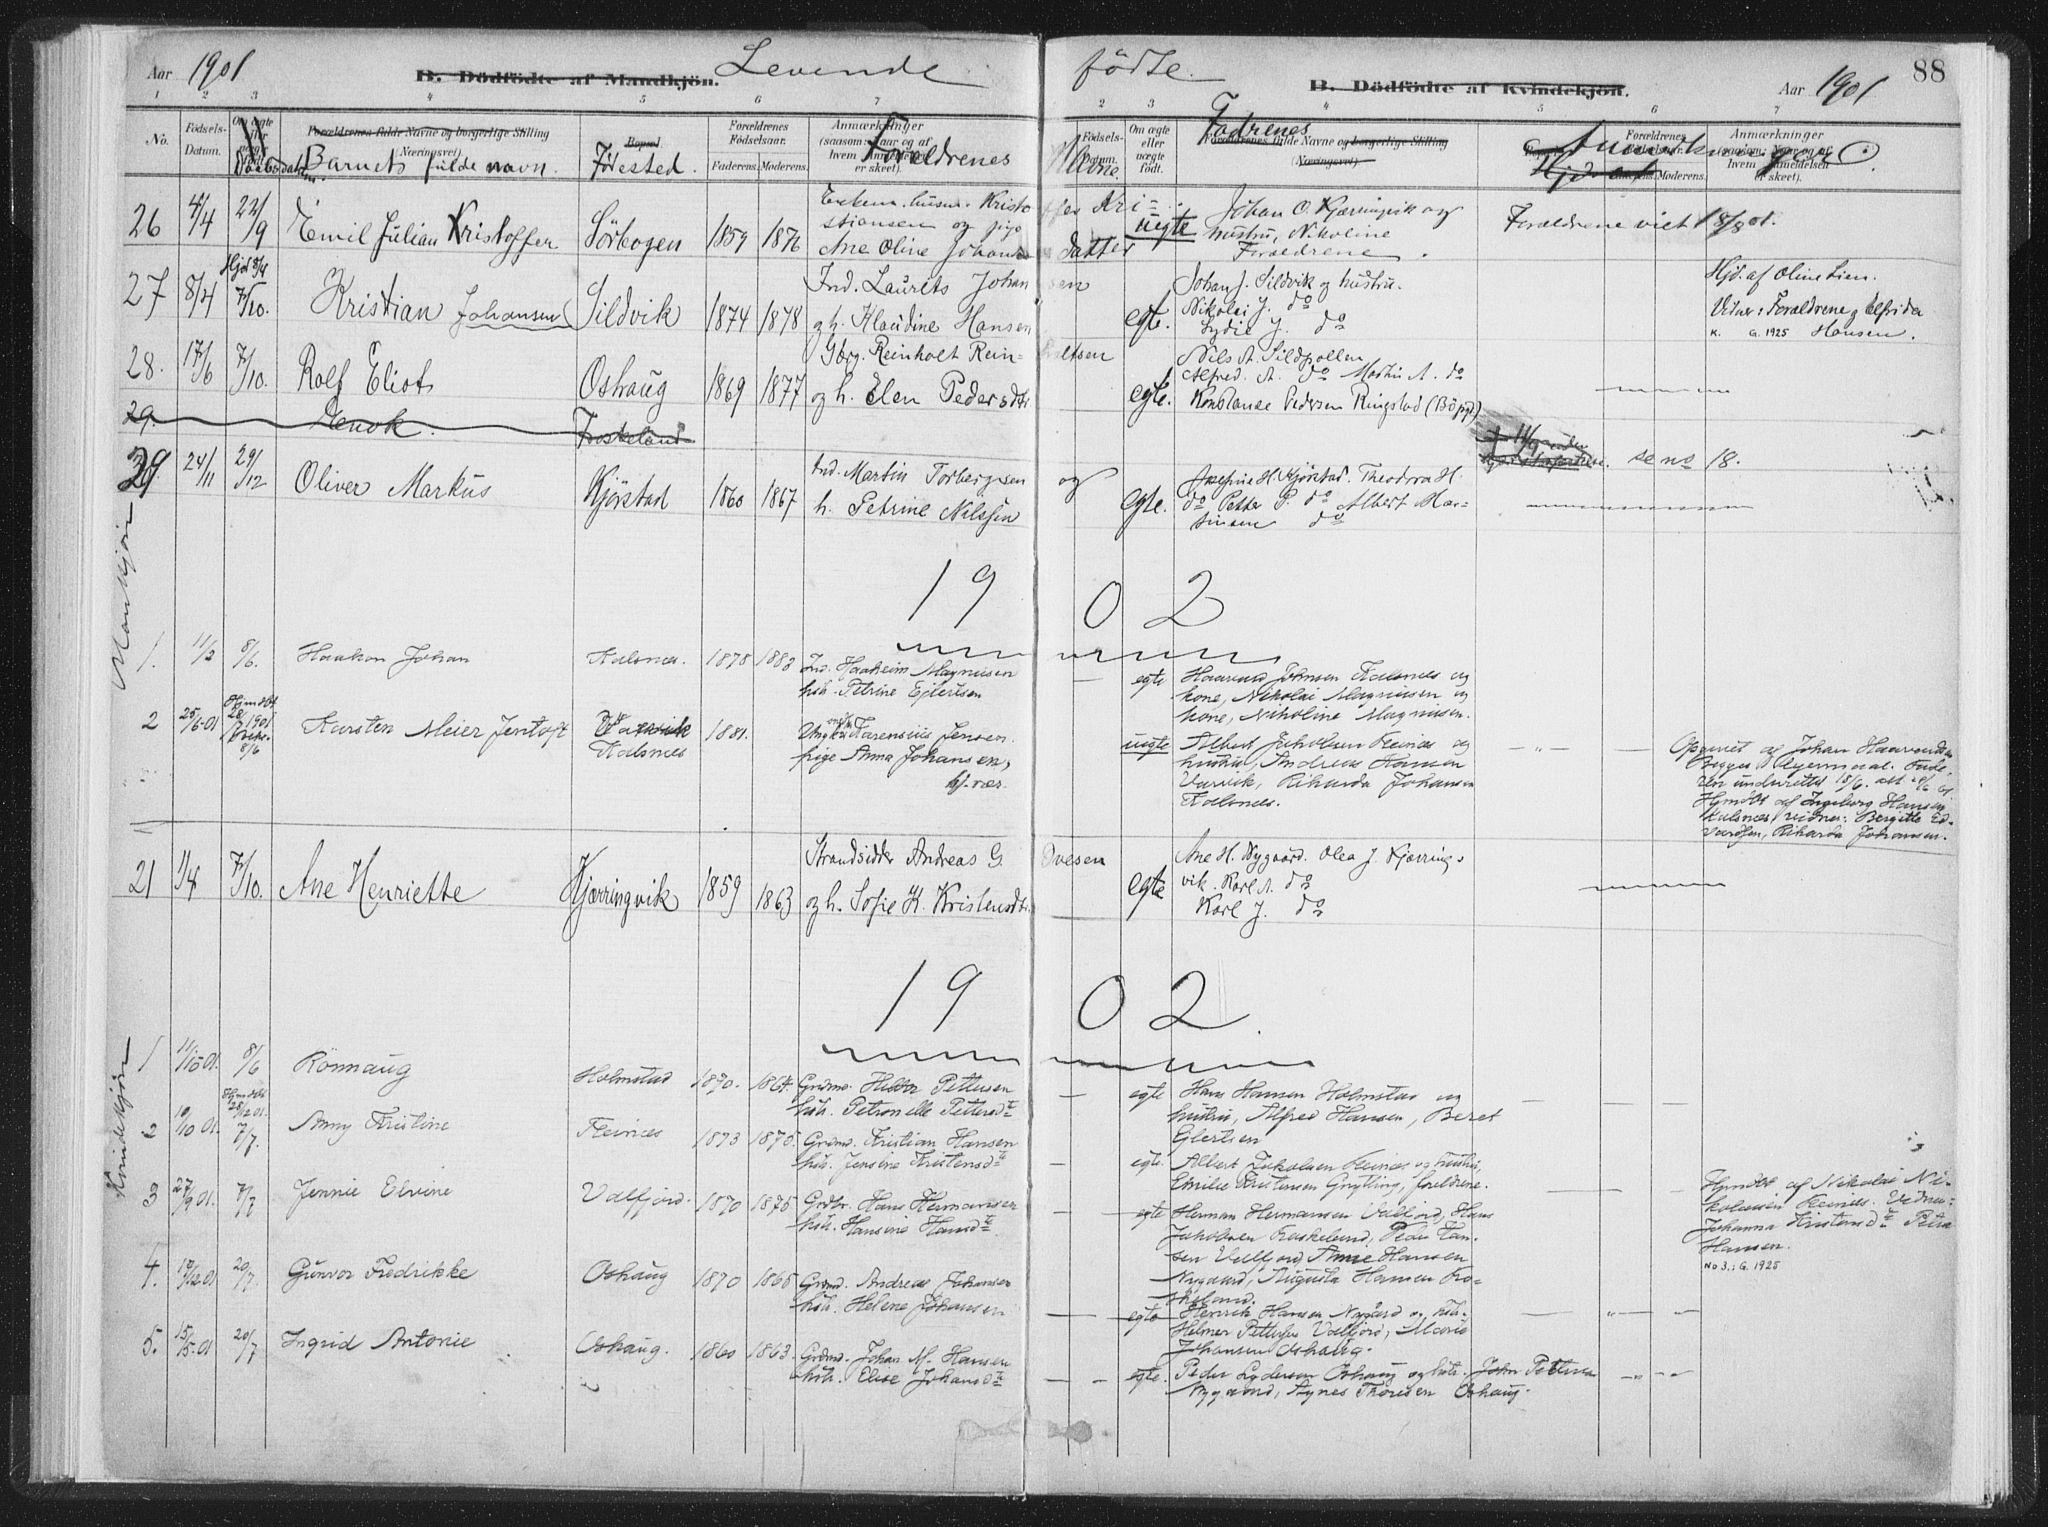 SAT, Ministerialprotokoller, klokkerbøker og fødselsregistre - Nordland, 890/L1286: Ministerialbok nr. 890A01, 1882-1902, s. 88